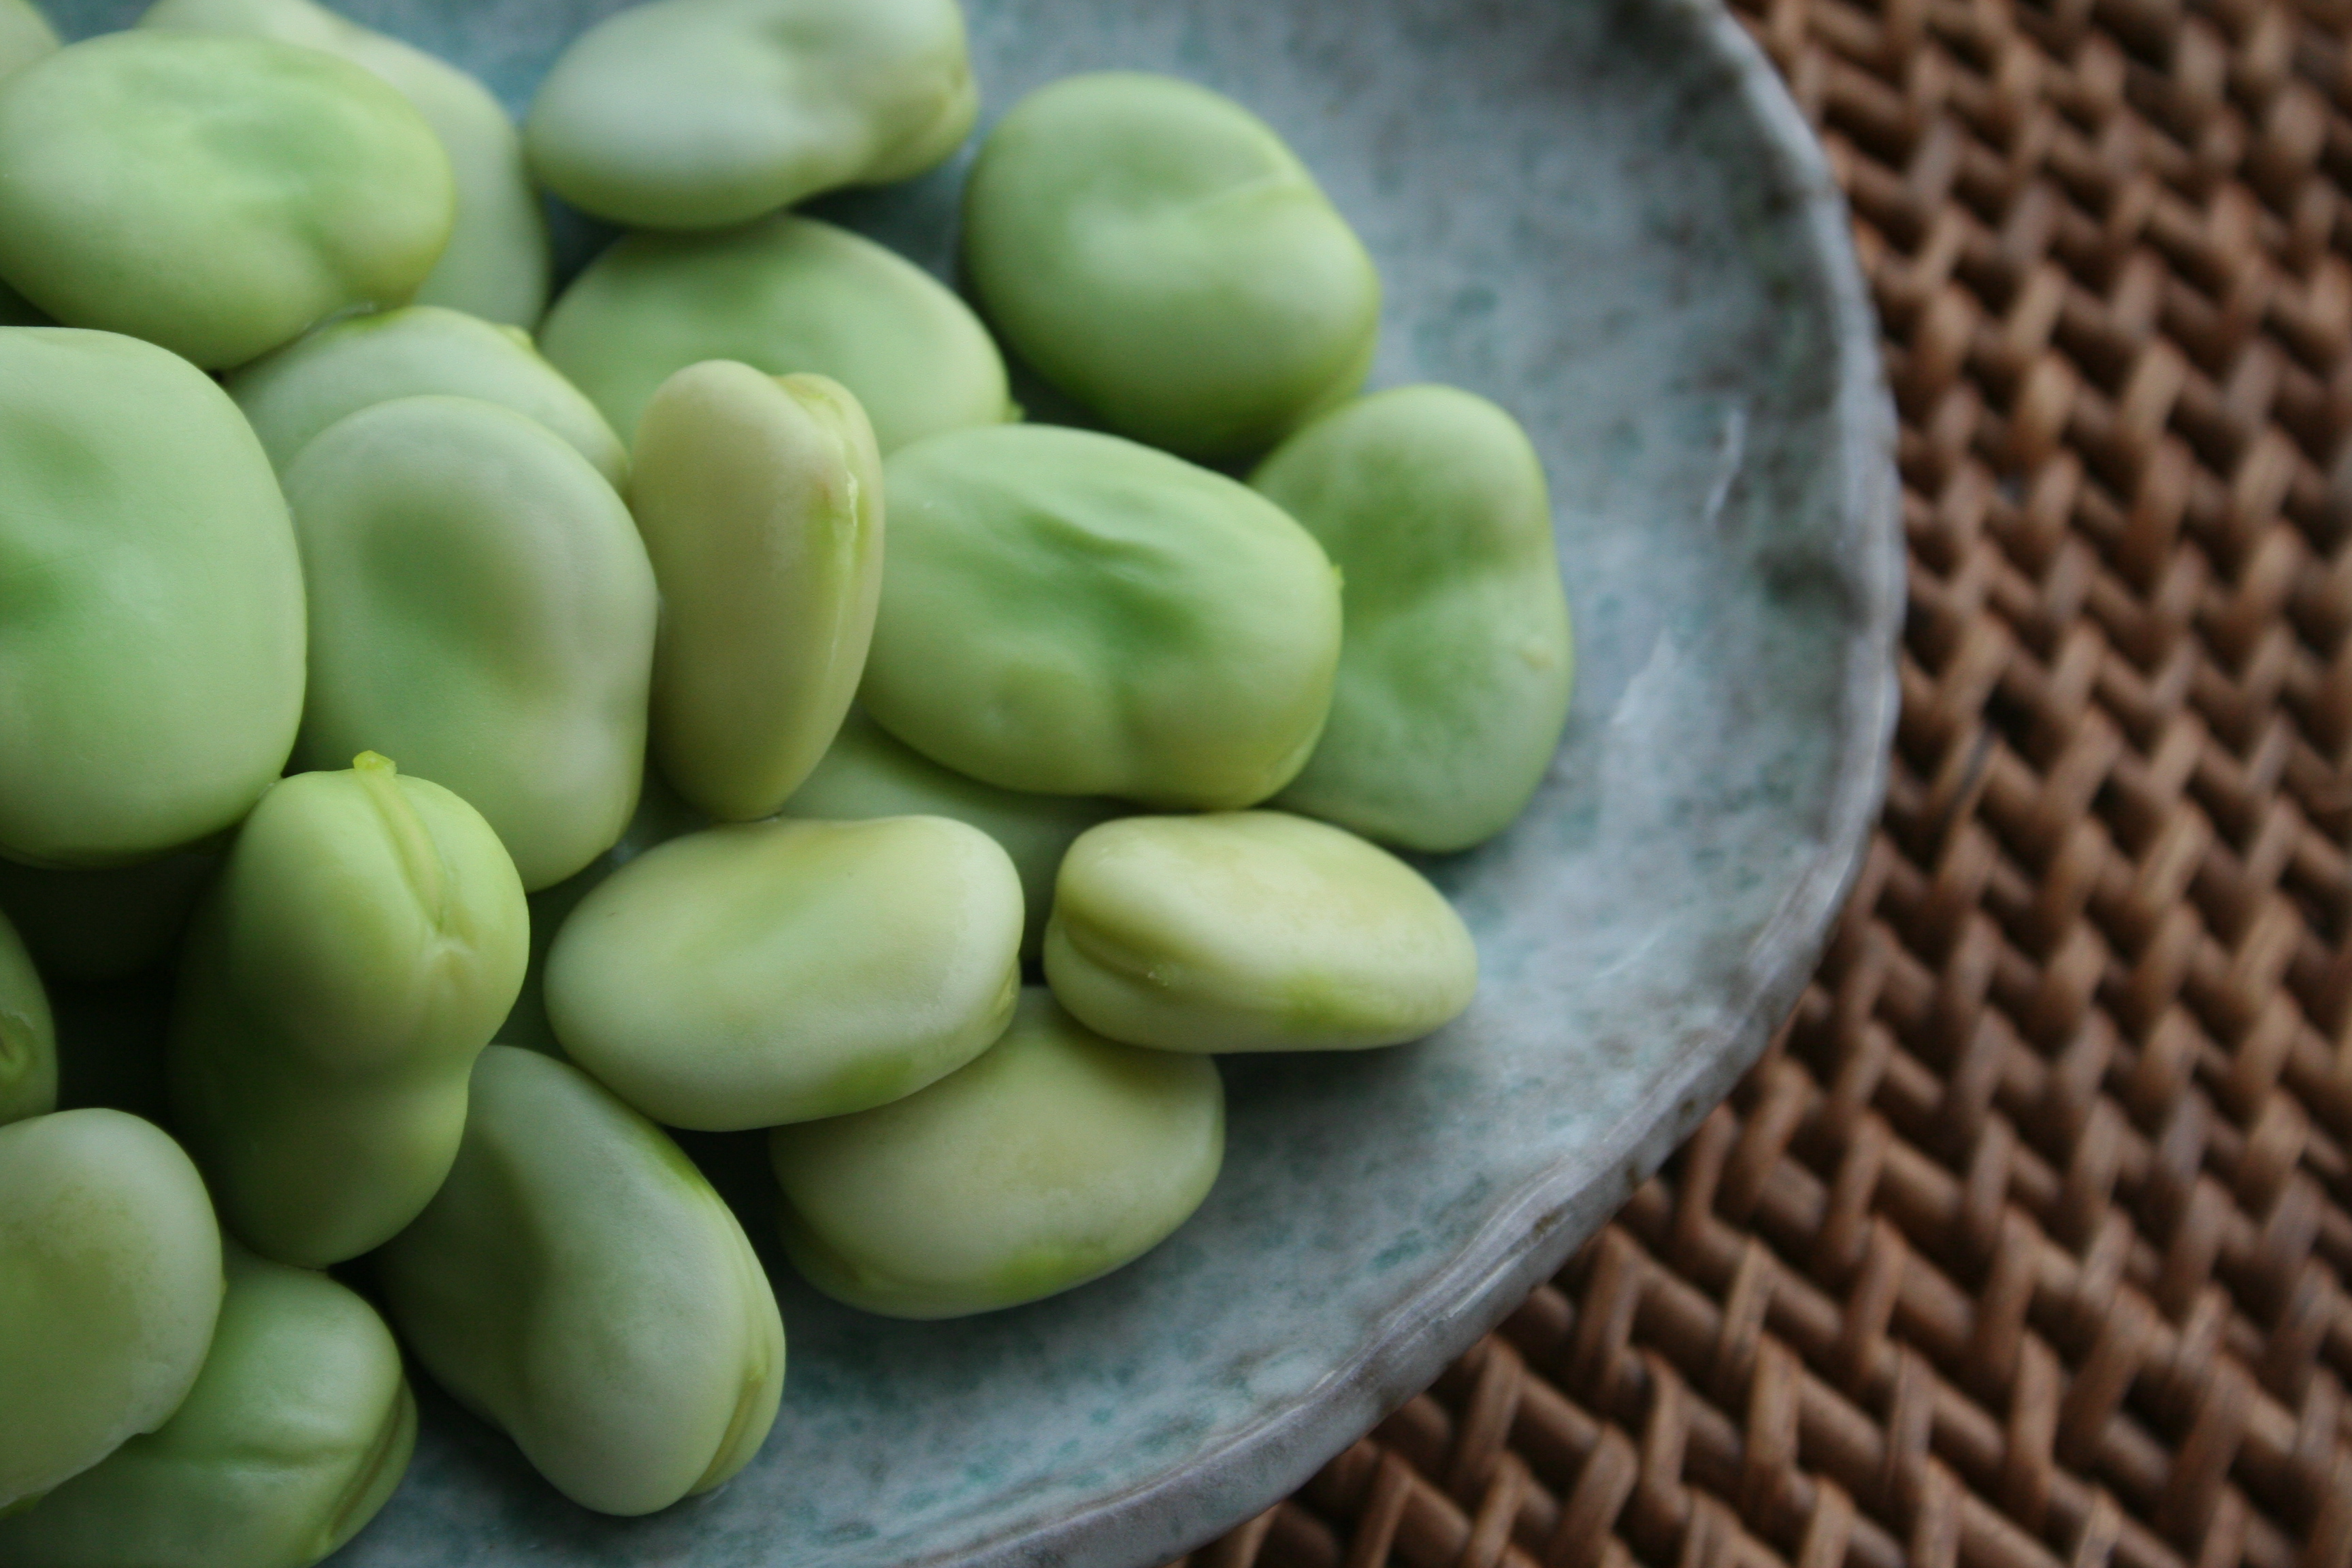 Risultati immagini per beans